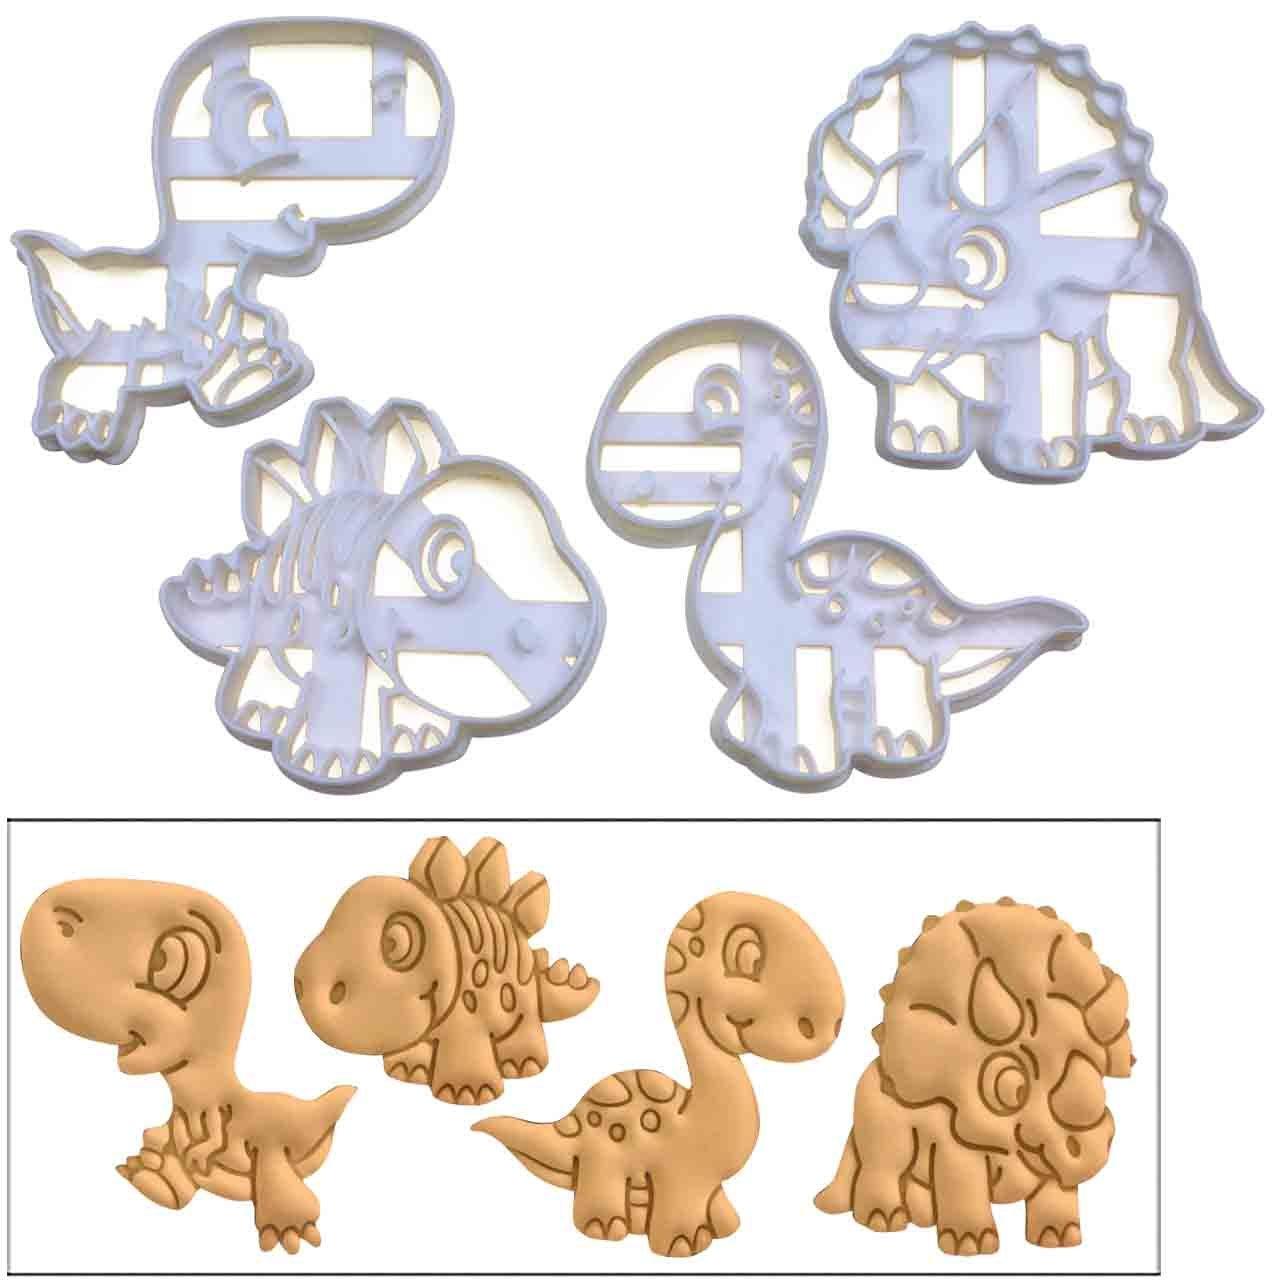 SET of 4 Baby Dinosaur cookie cutters (Tyrannosaurus Rex, Stegosaurus, Triceratops, & Brachiosaurus), 4 pcs, Ideal gift for dinosaur theme parties